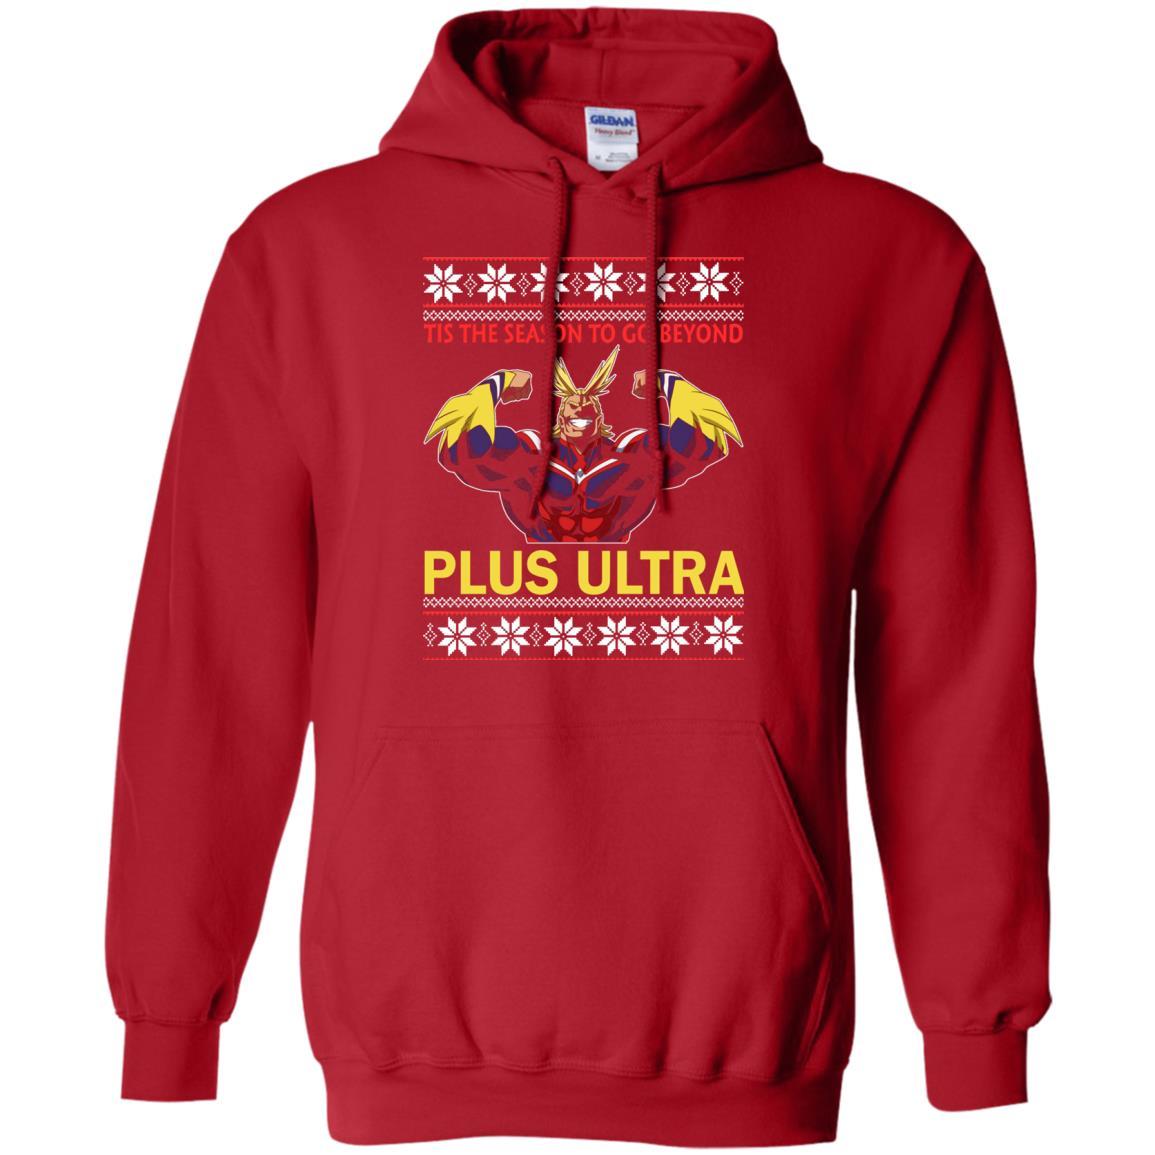 image 5267 - Tis The Season To Go Beyond Plus Ultra Christmas Sweater, Shirt